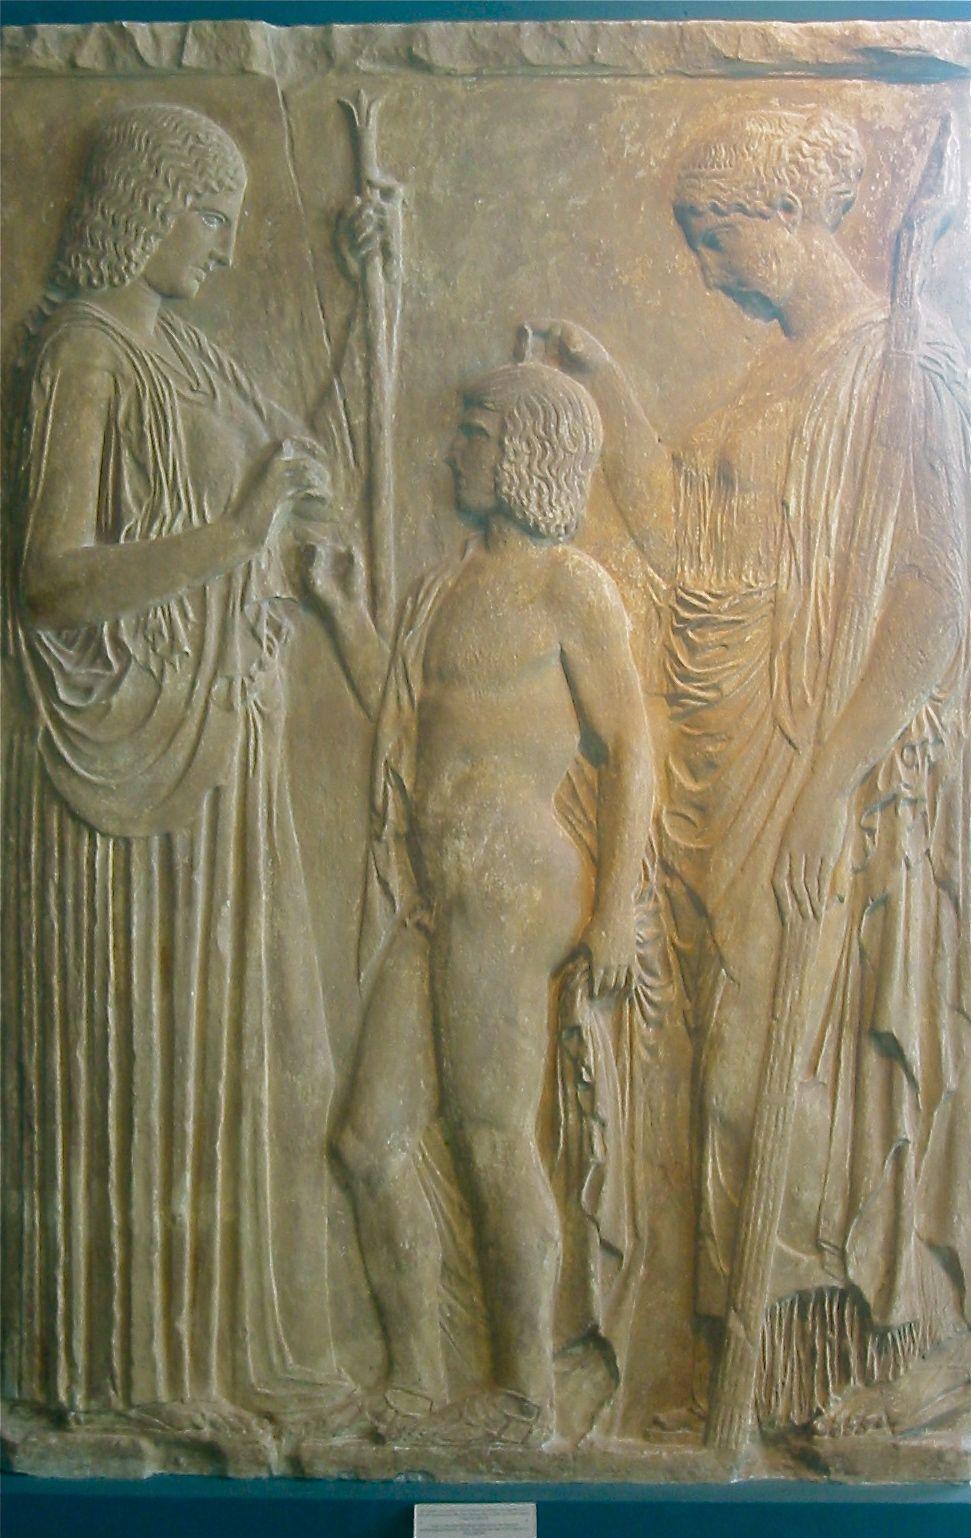 My Ancient Greek Internship Deiknumena Things Shown